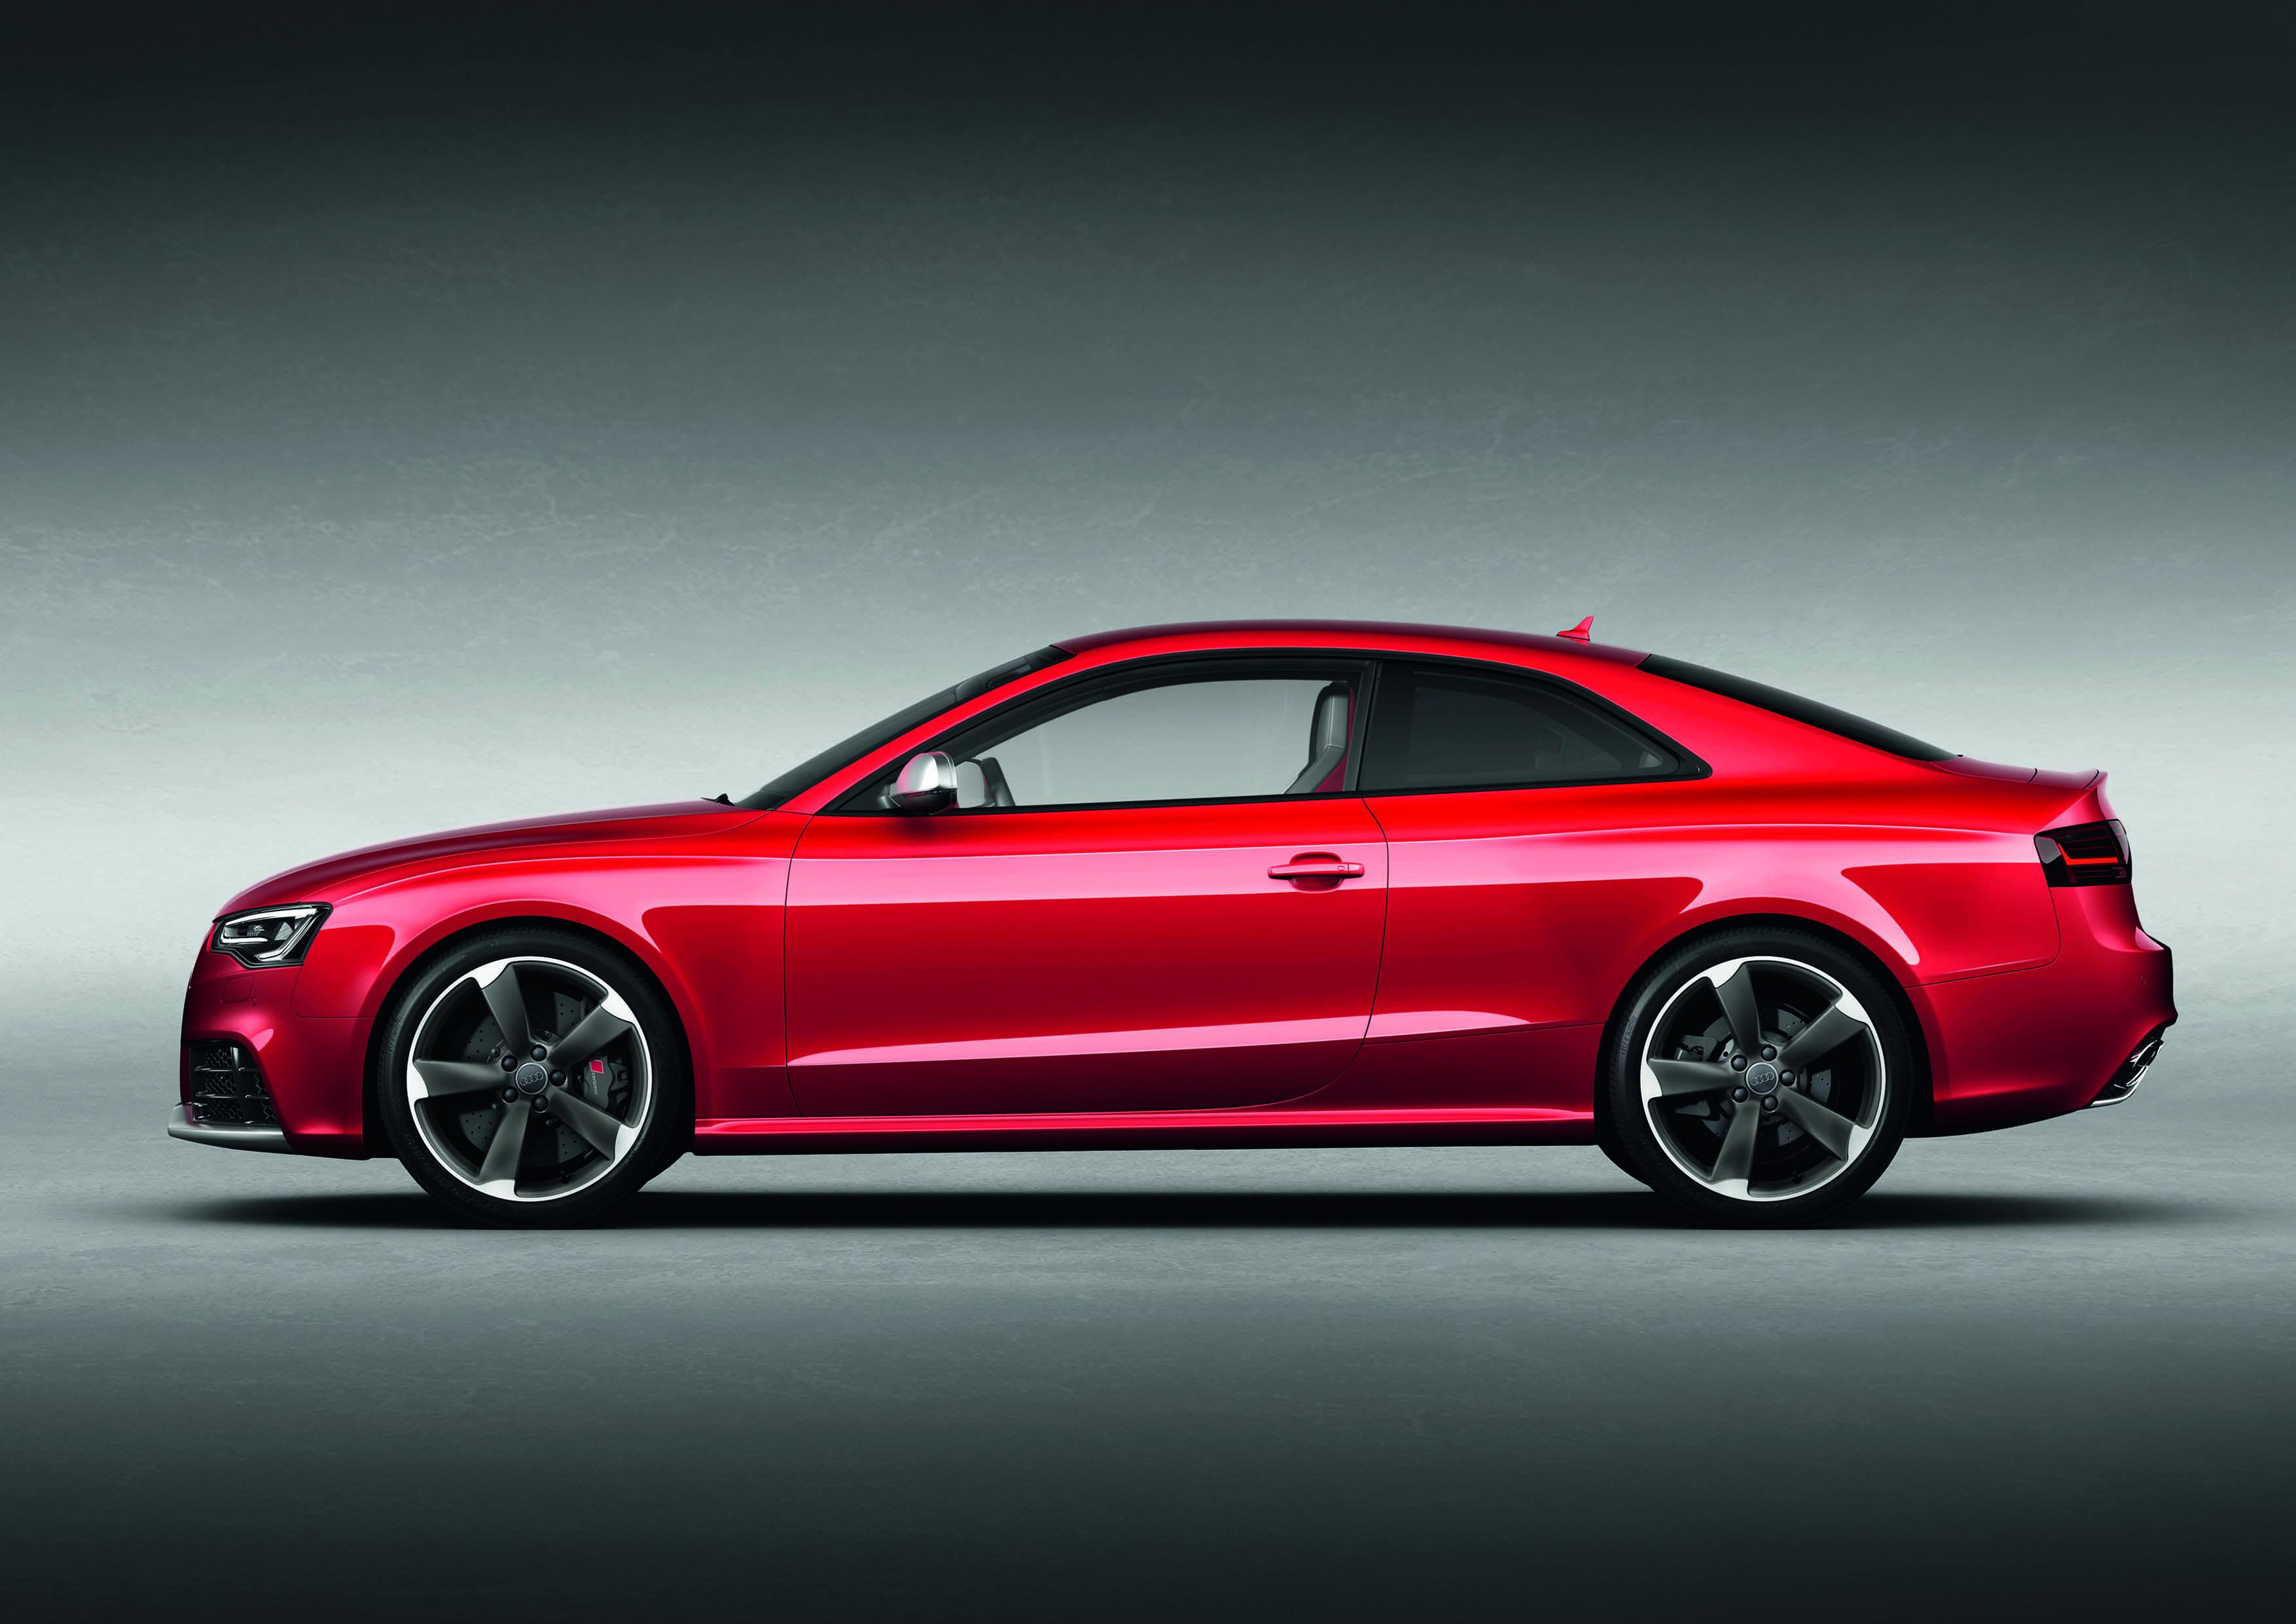 2012 Audi RS5 High